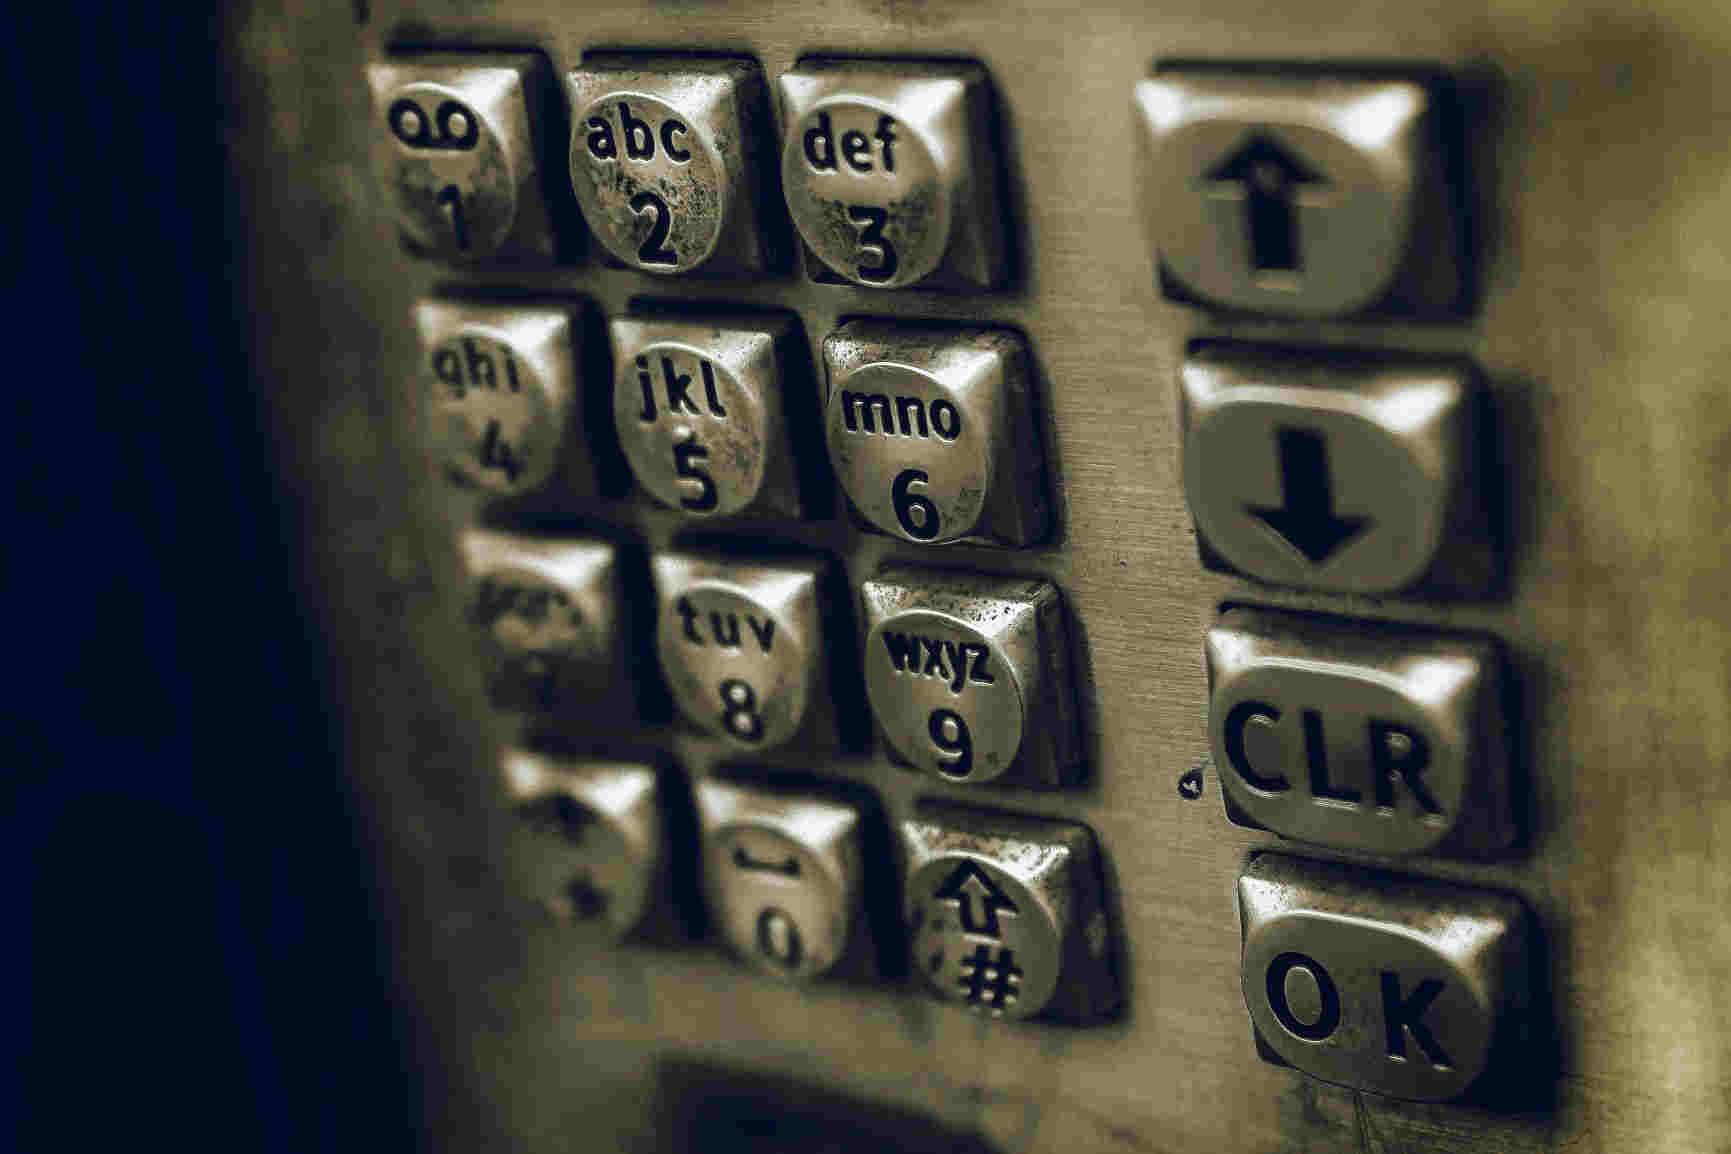 Keyless entry with numeric keypad